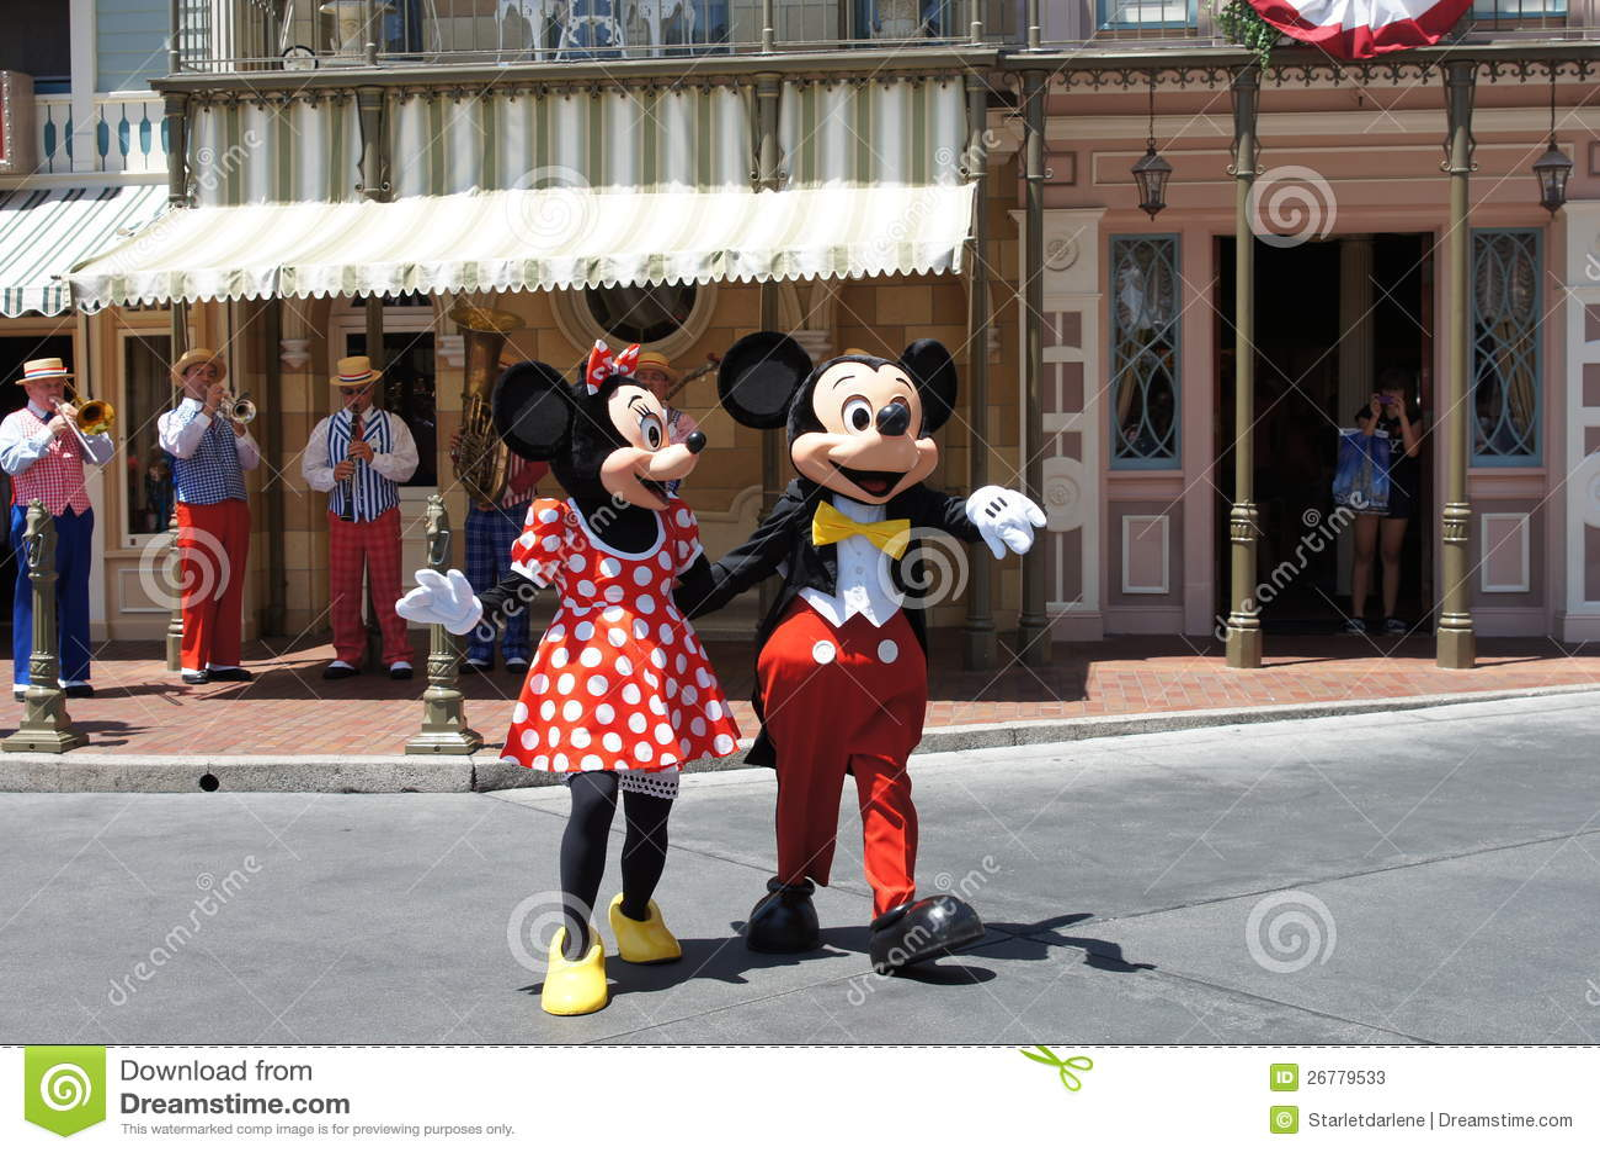 Minnie y Mickey Mouse en Disneylandya